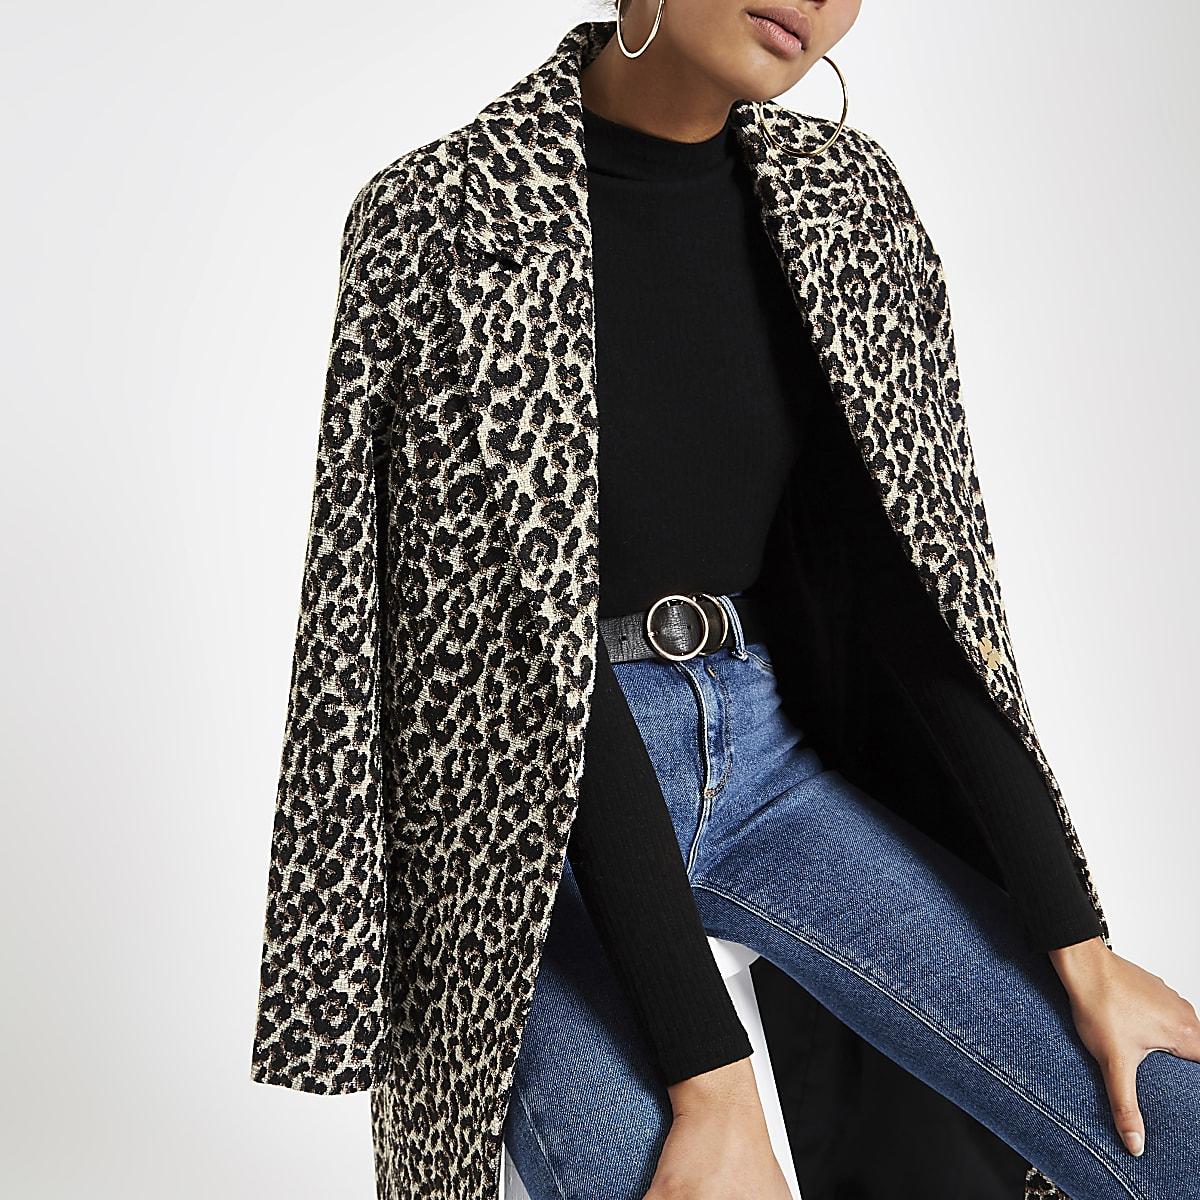 Leopard print jacquard jacket